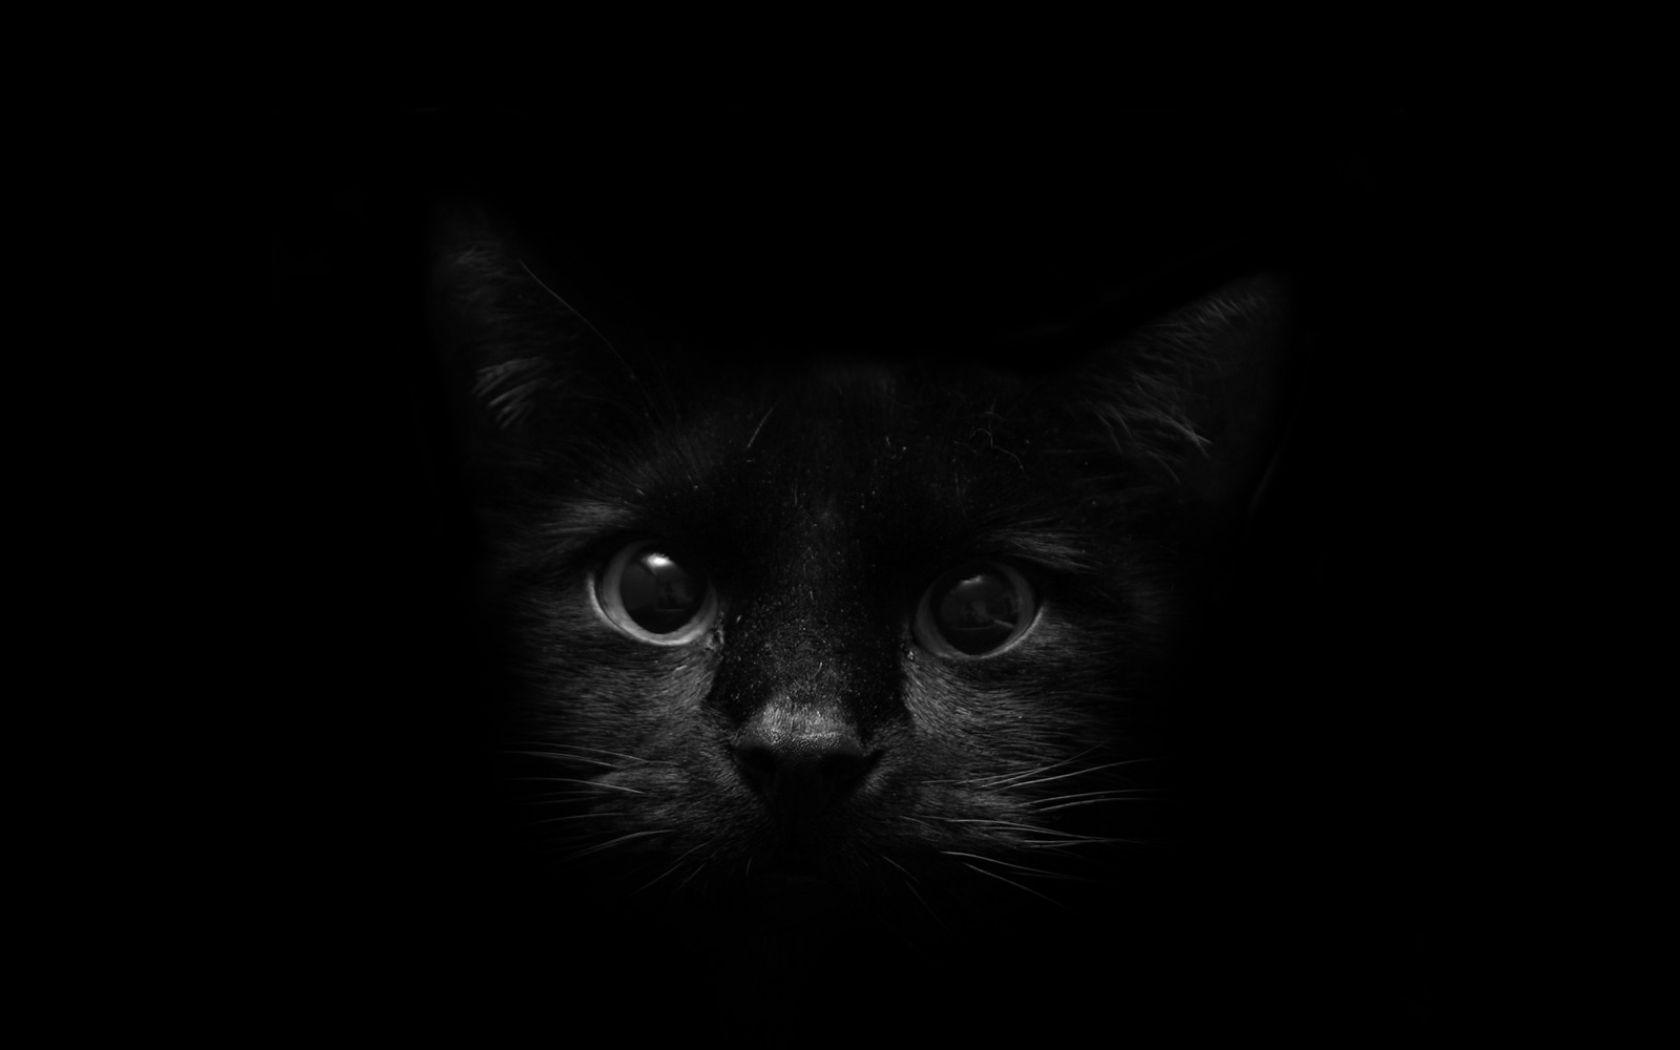 Download Wallpapers Download 1680x1050 Eyes Black Dark Cats Animals Pets Black Background 1600x1200 Wallpaper Wa Black Cat Images Cat Background Cat Wallpaper